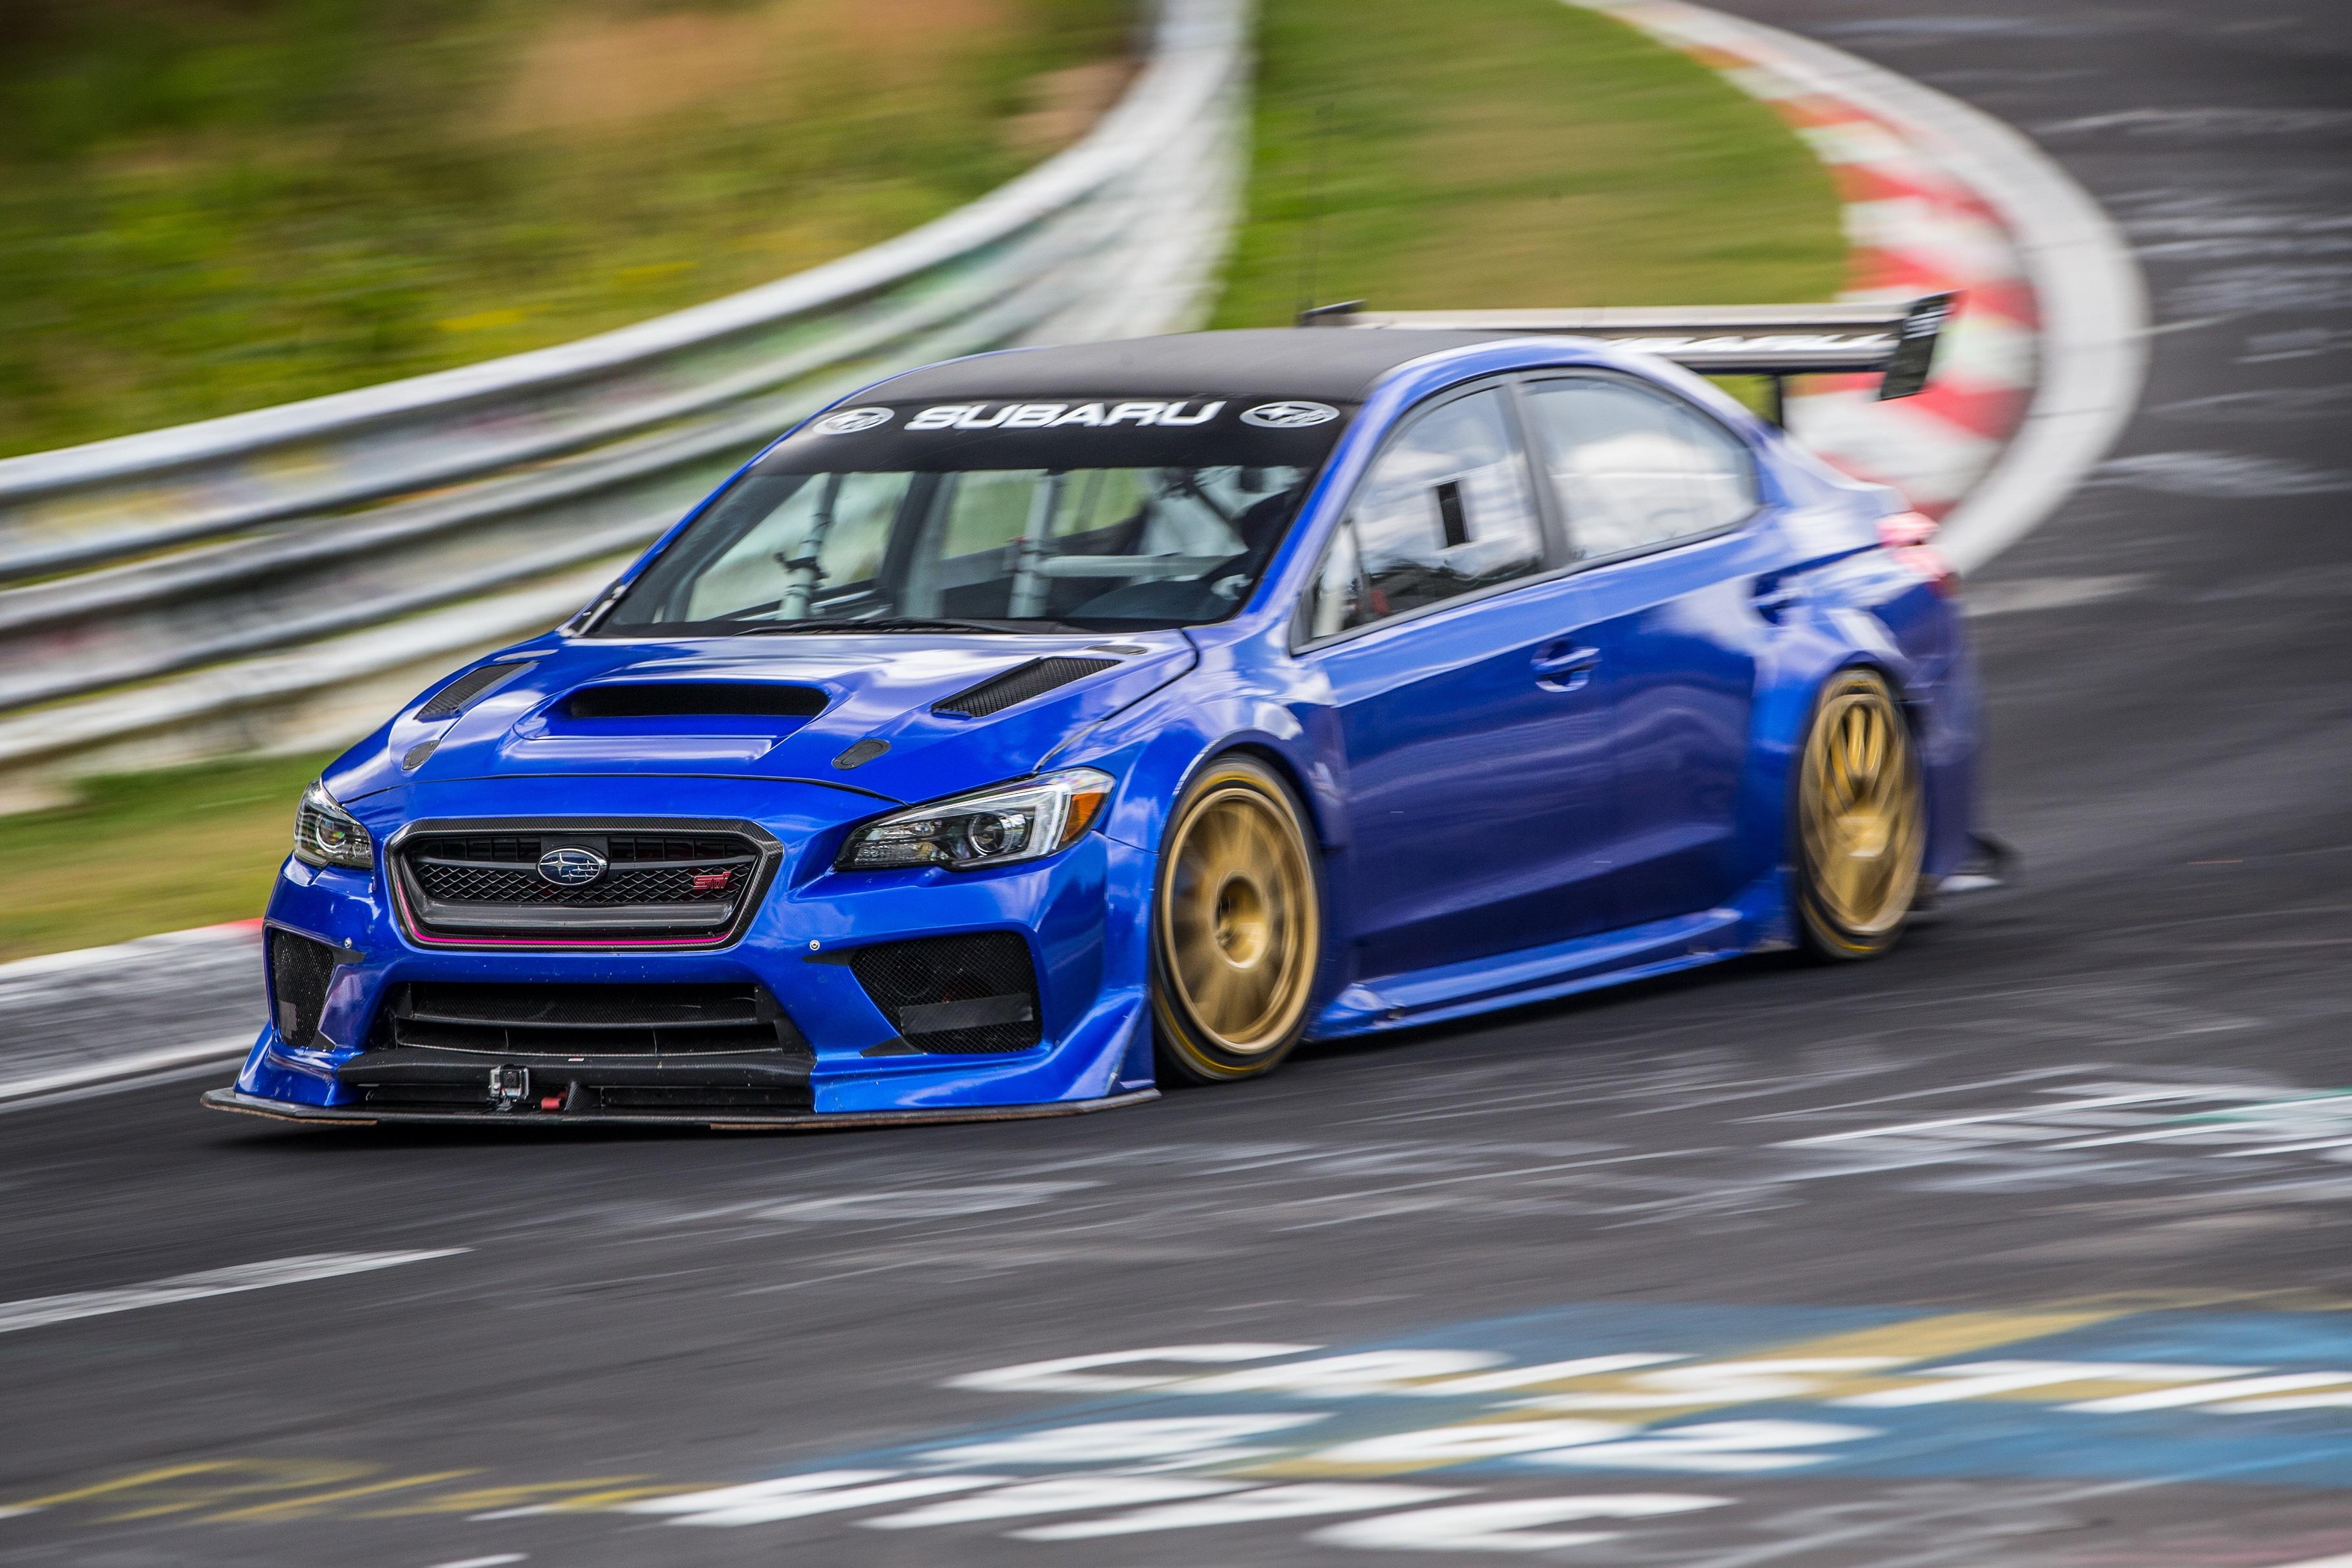 Record en Nürburgring del Subaru WRX STI Type RA NBR Special 1